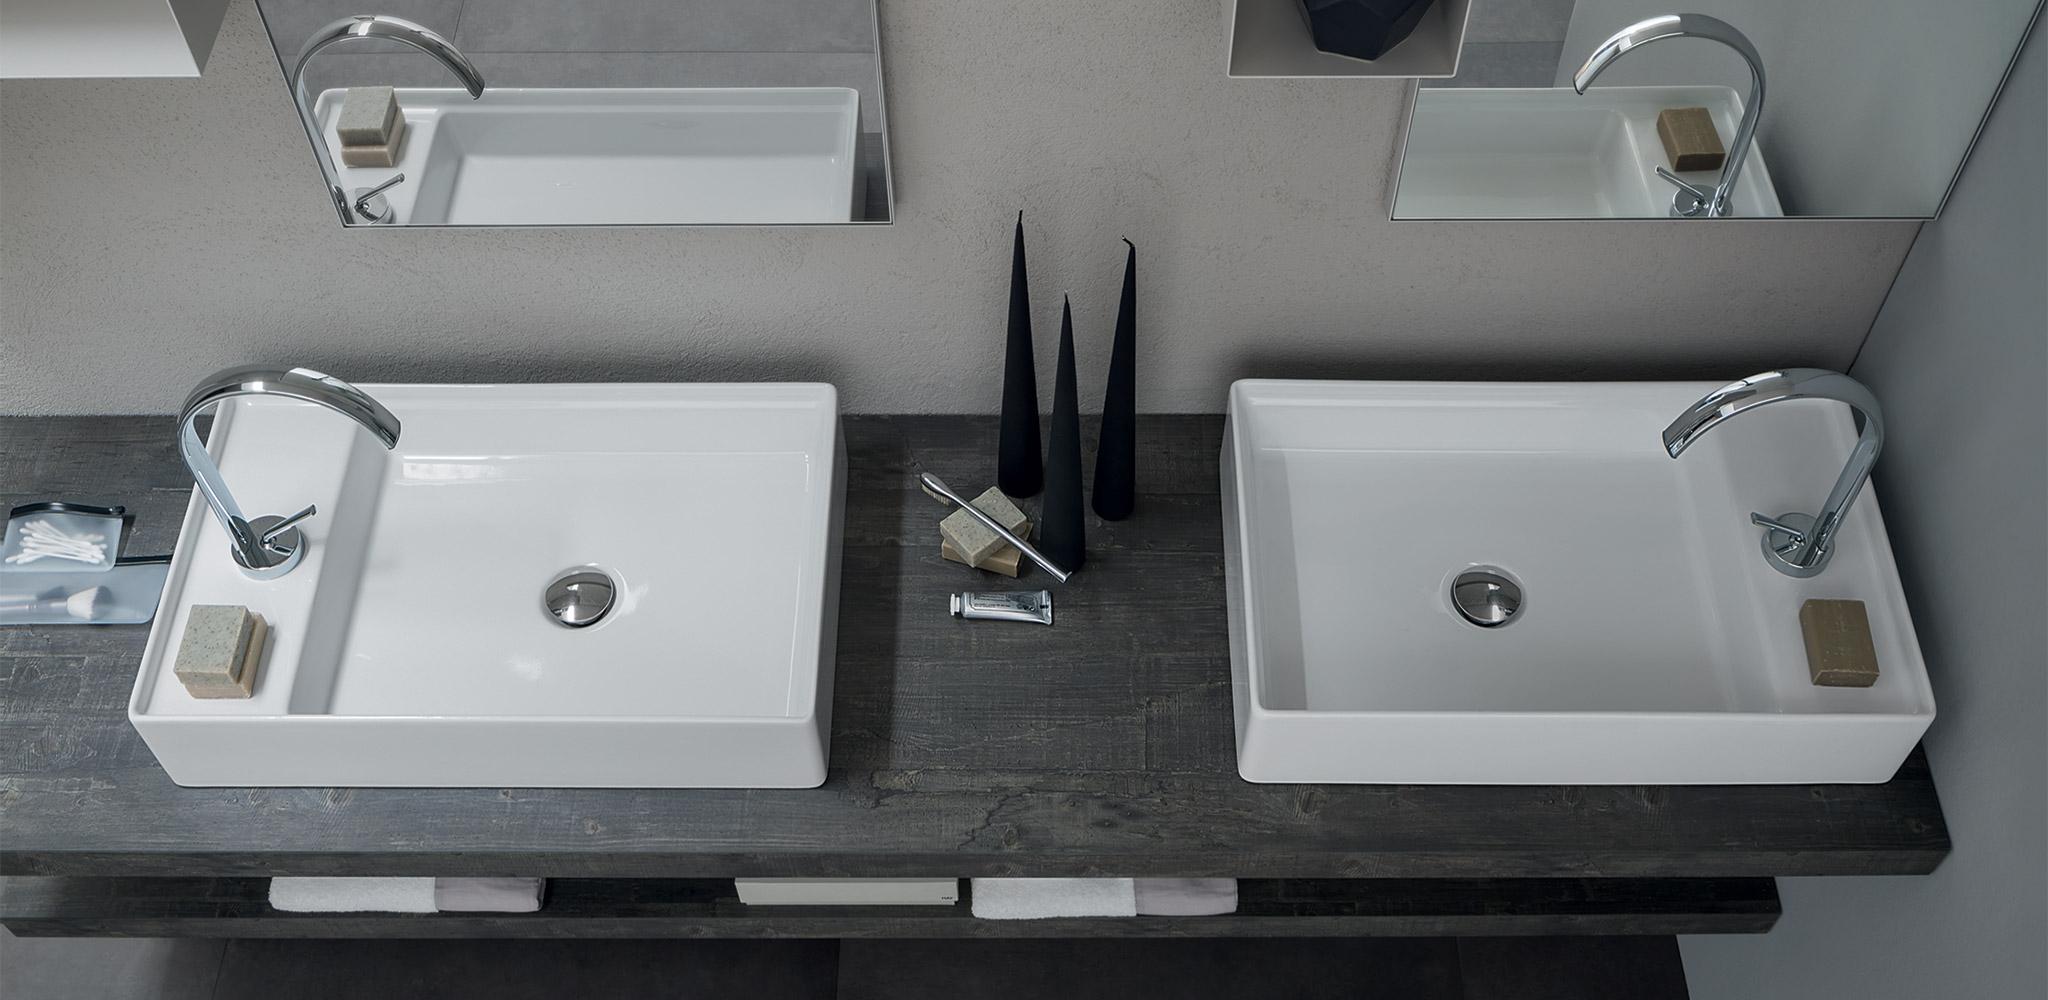 Emejing bagno con doppio lavabo images - Lavabo doppio bagno ...